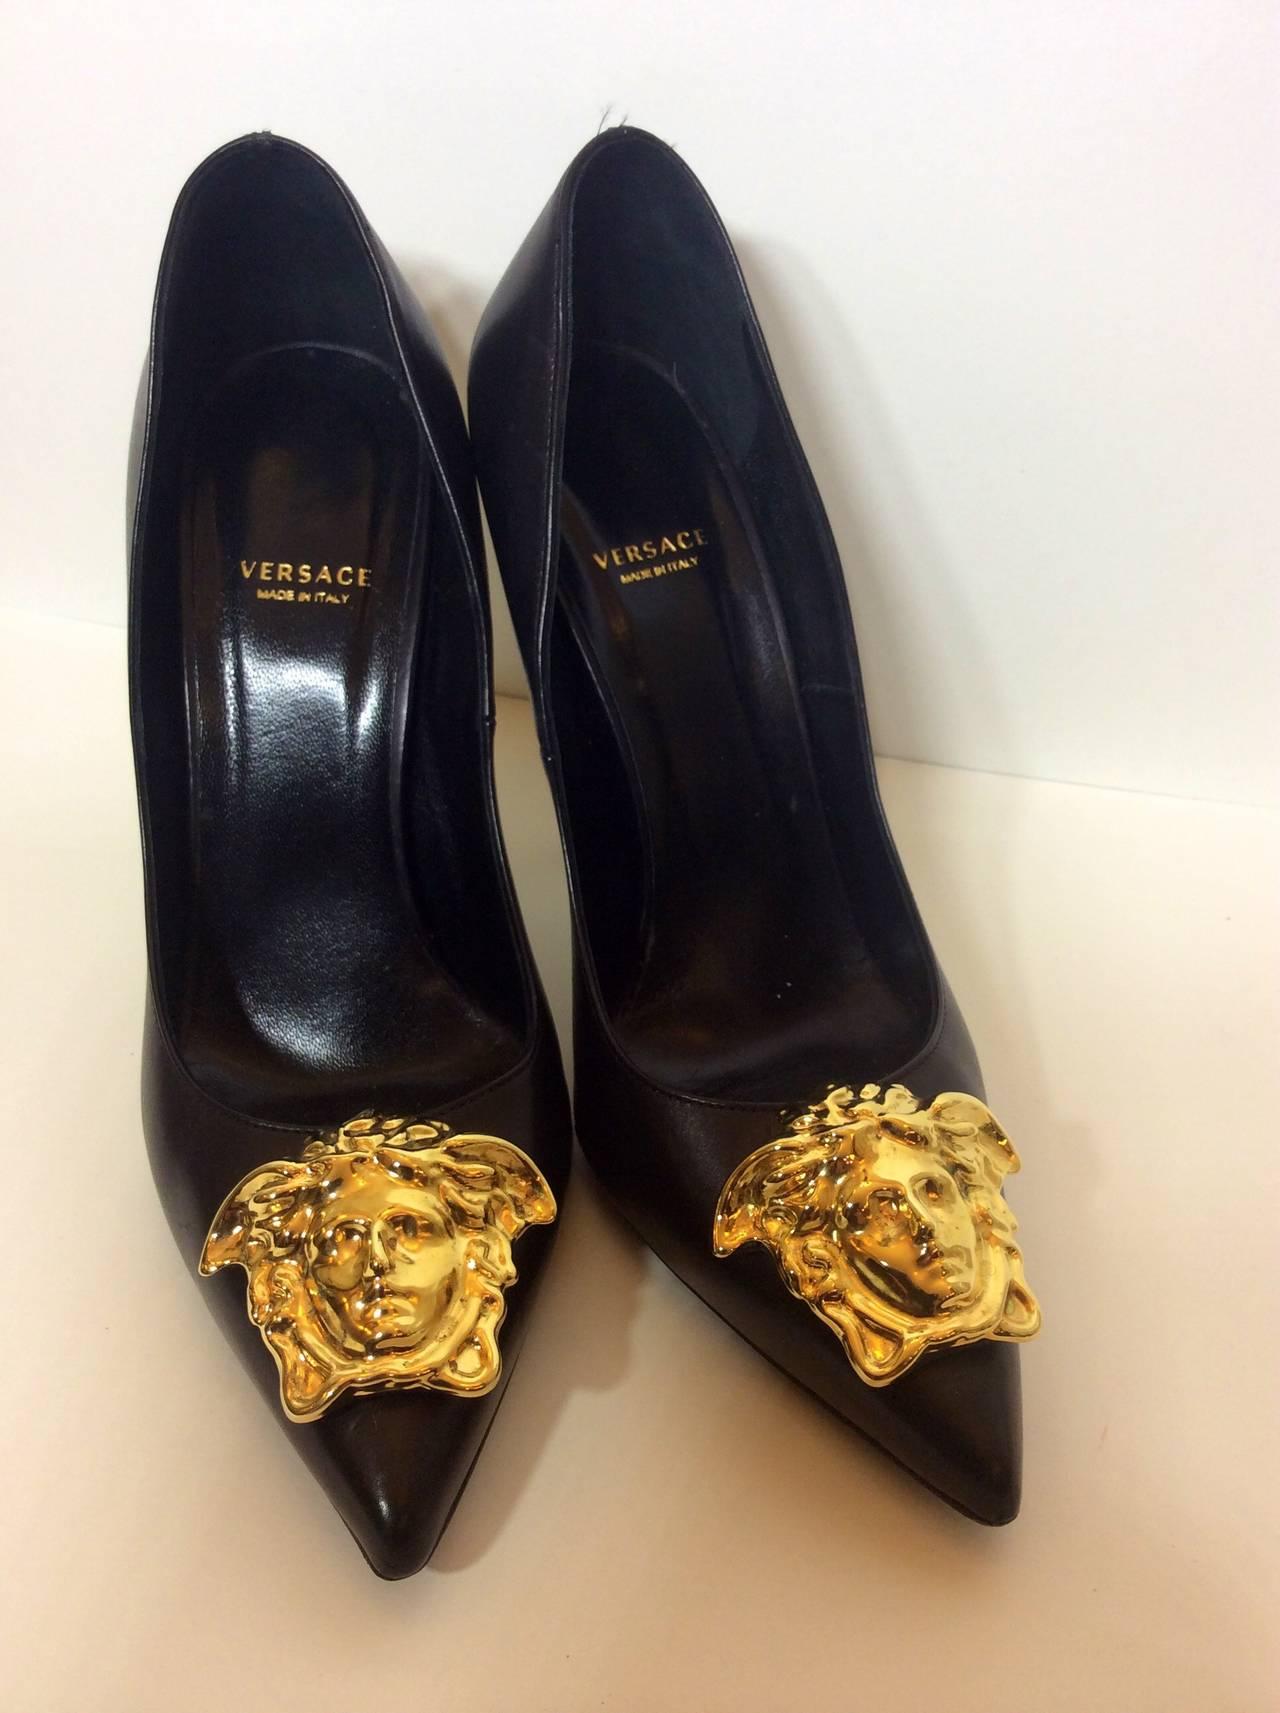 Versace Palazzo Stiletto Gold Medusa High Heels 39 12 At